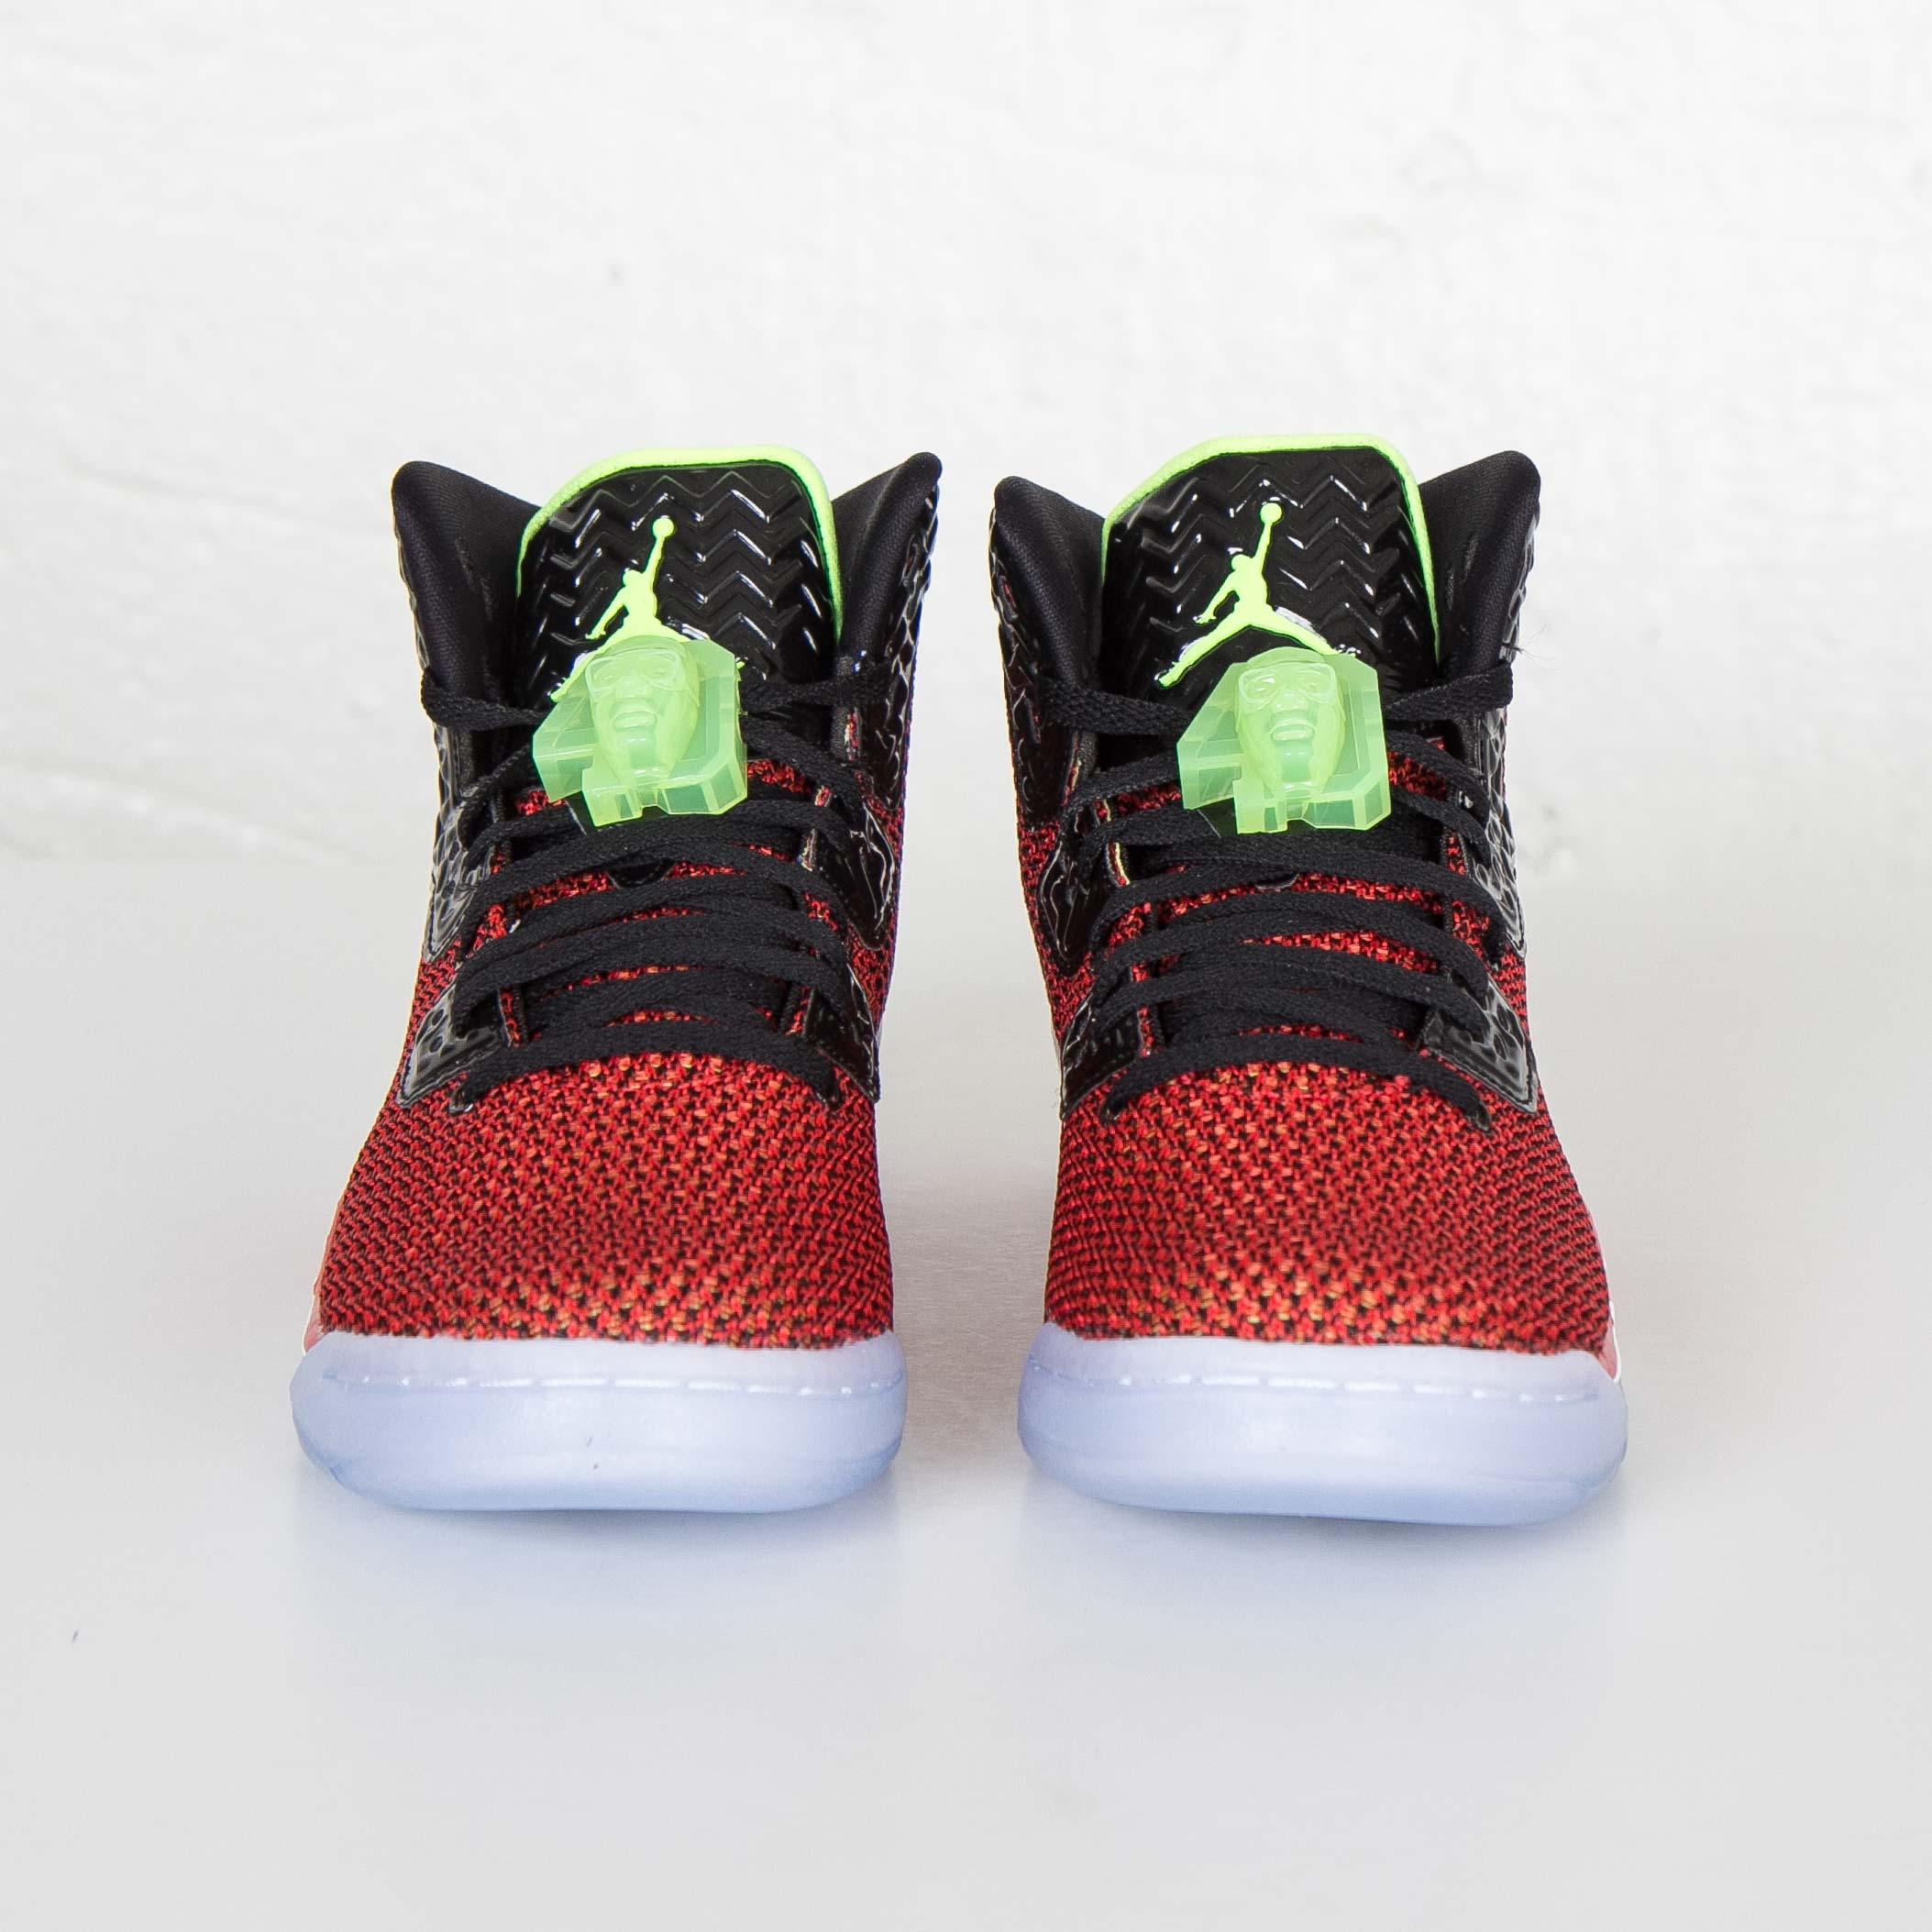 best authentic 8b998 155cf Jordan Brand Air Jordan Spike Forty - 807542-605 - Sneakersnstuff    sneakers   streetwear online since 1999